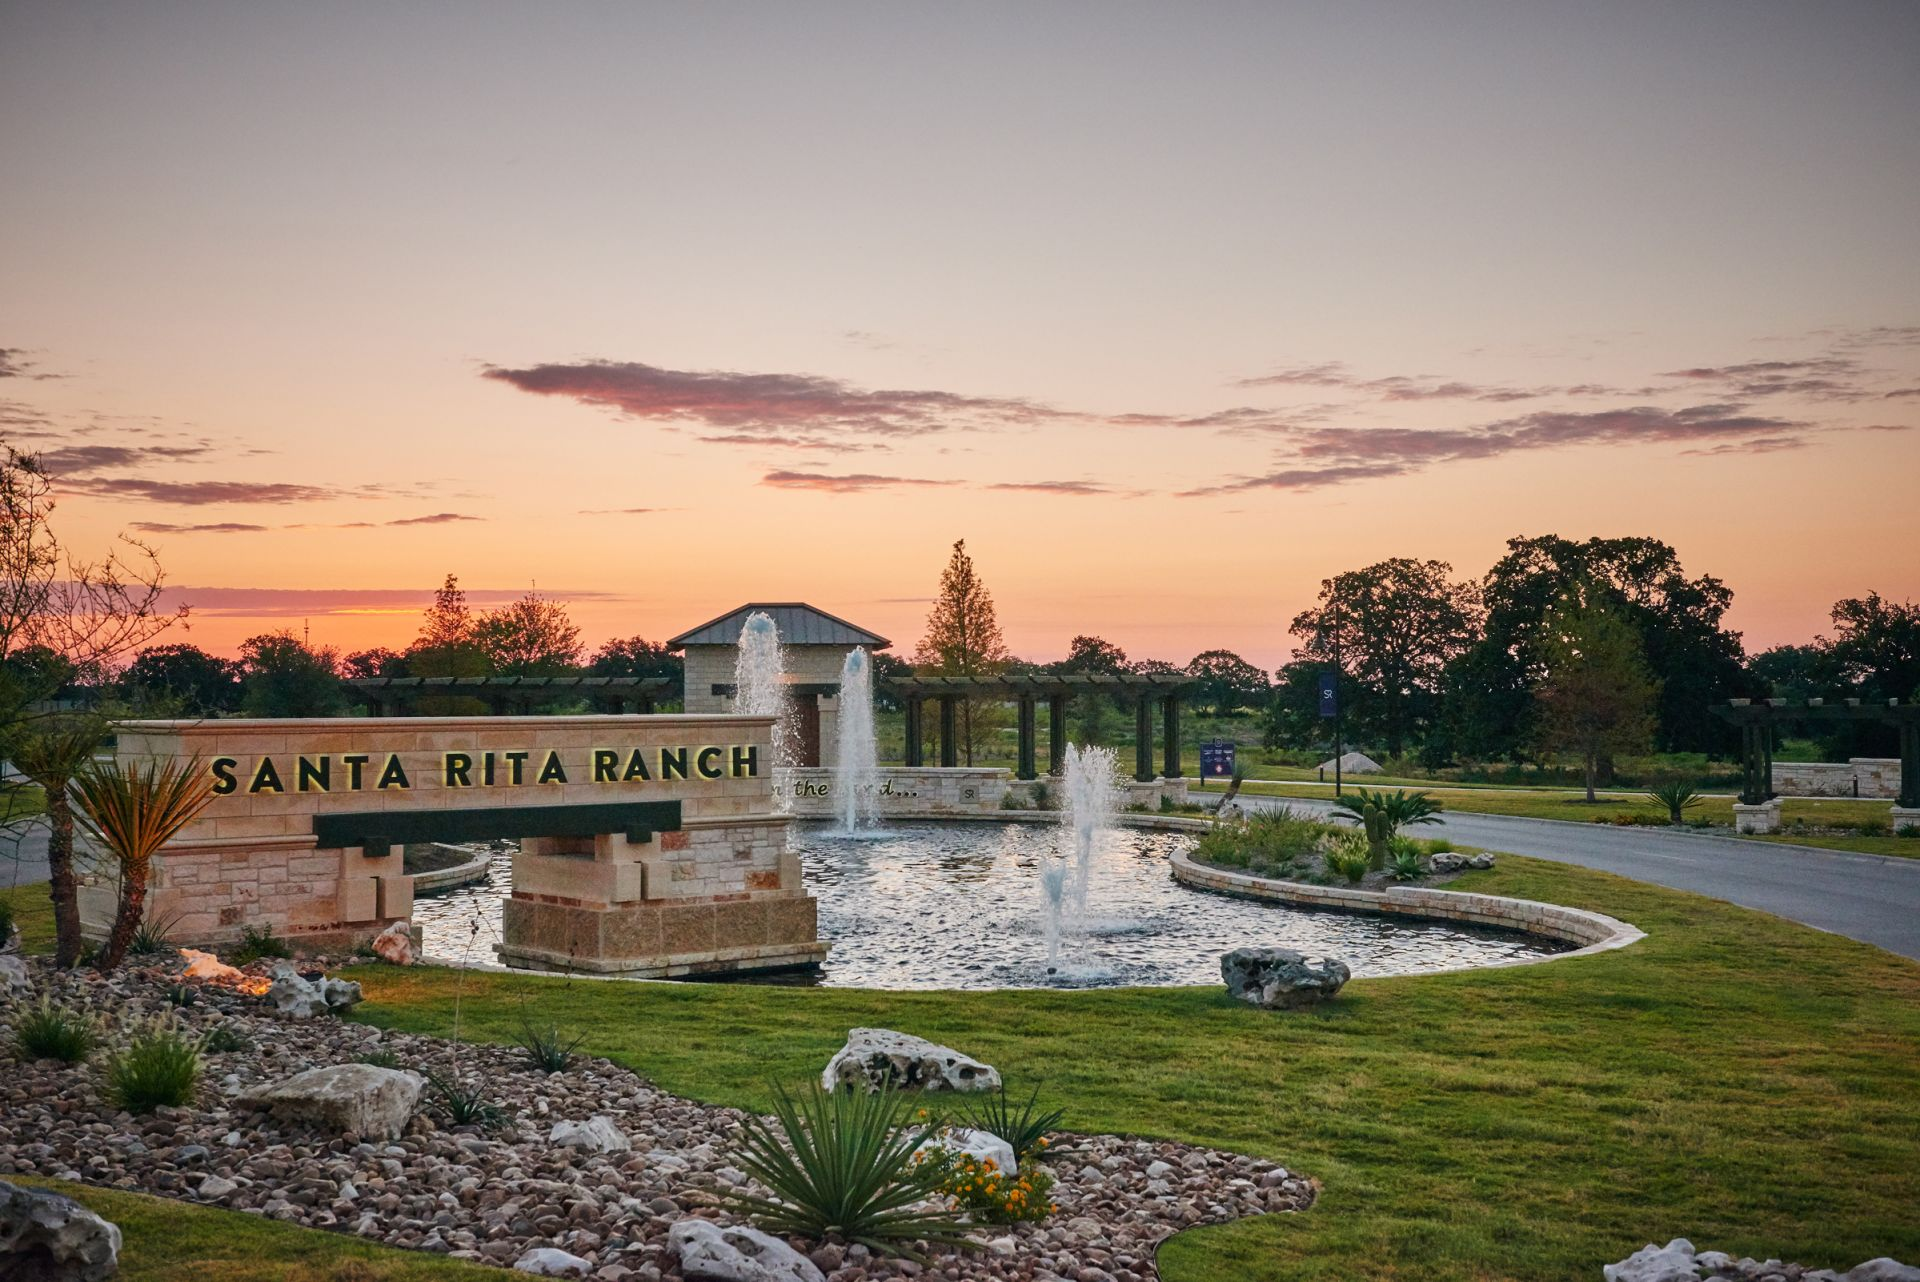 Santa Rita Ranch